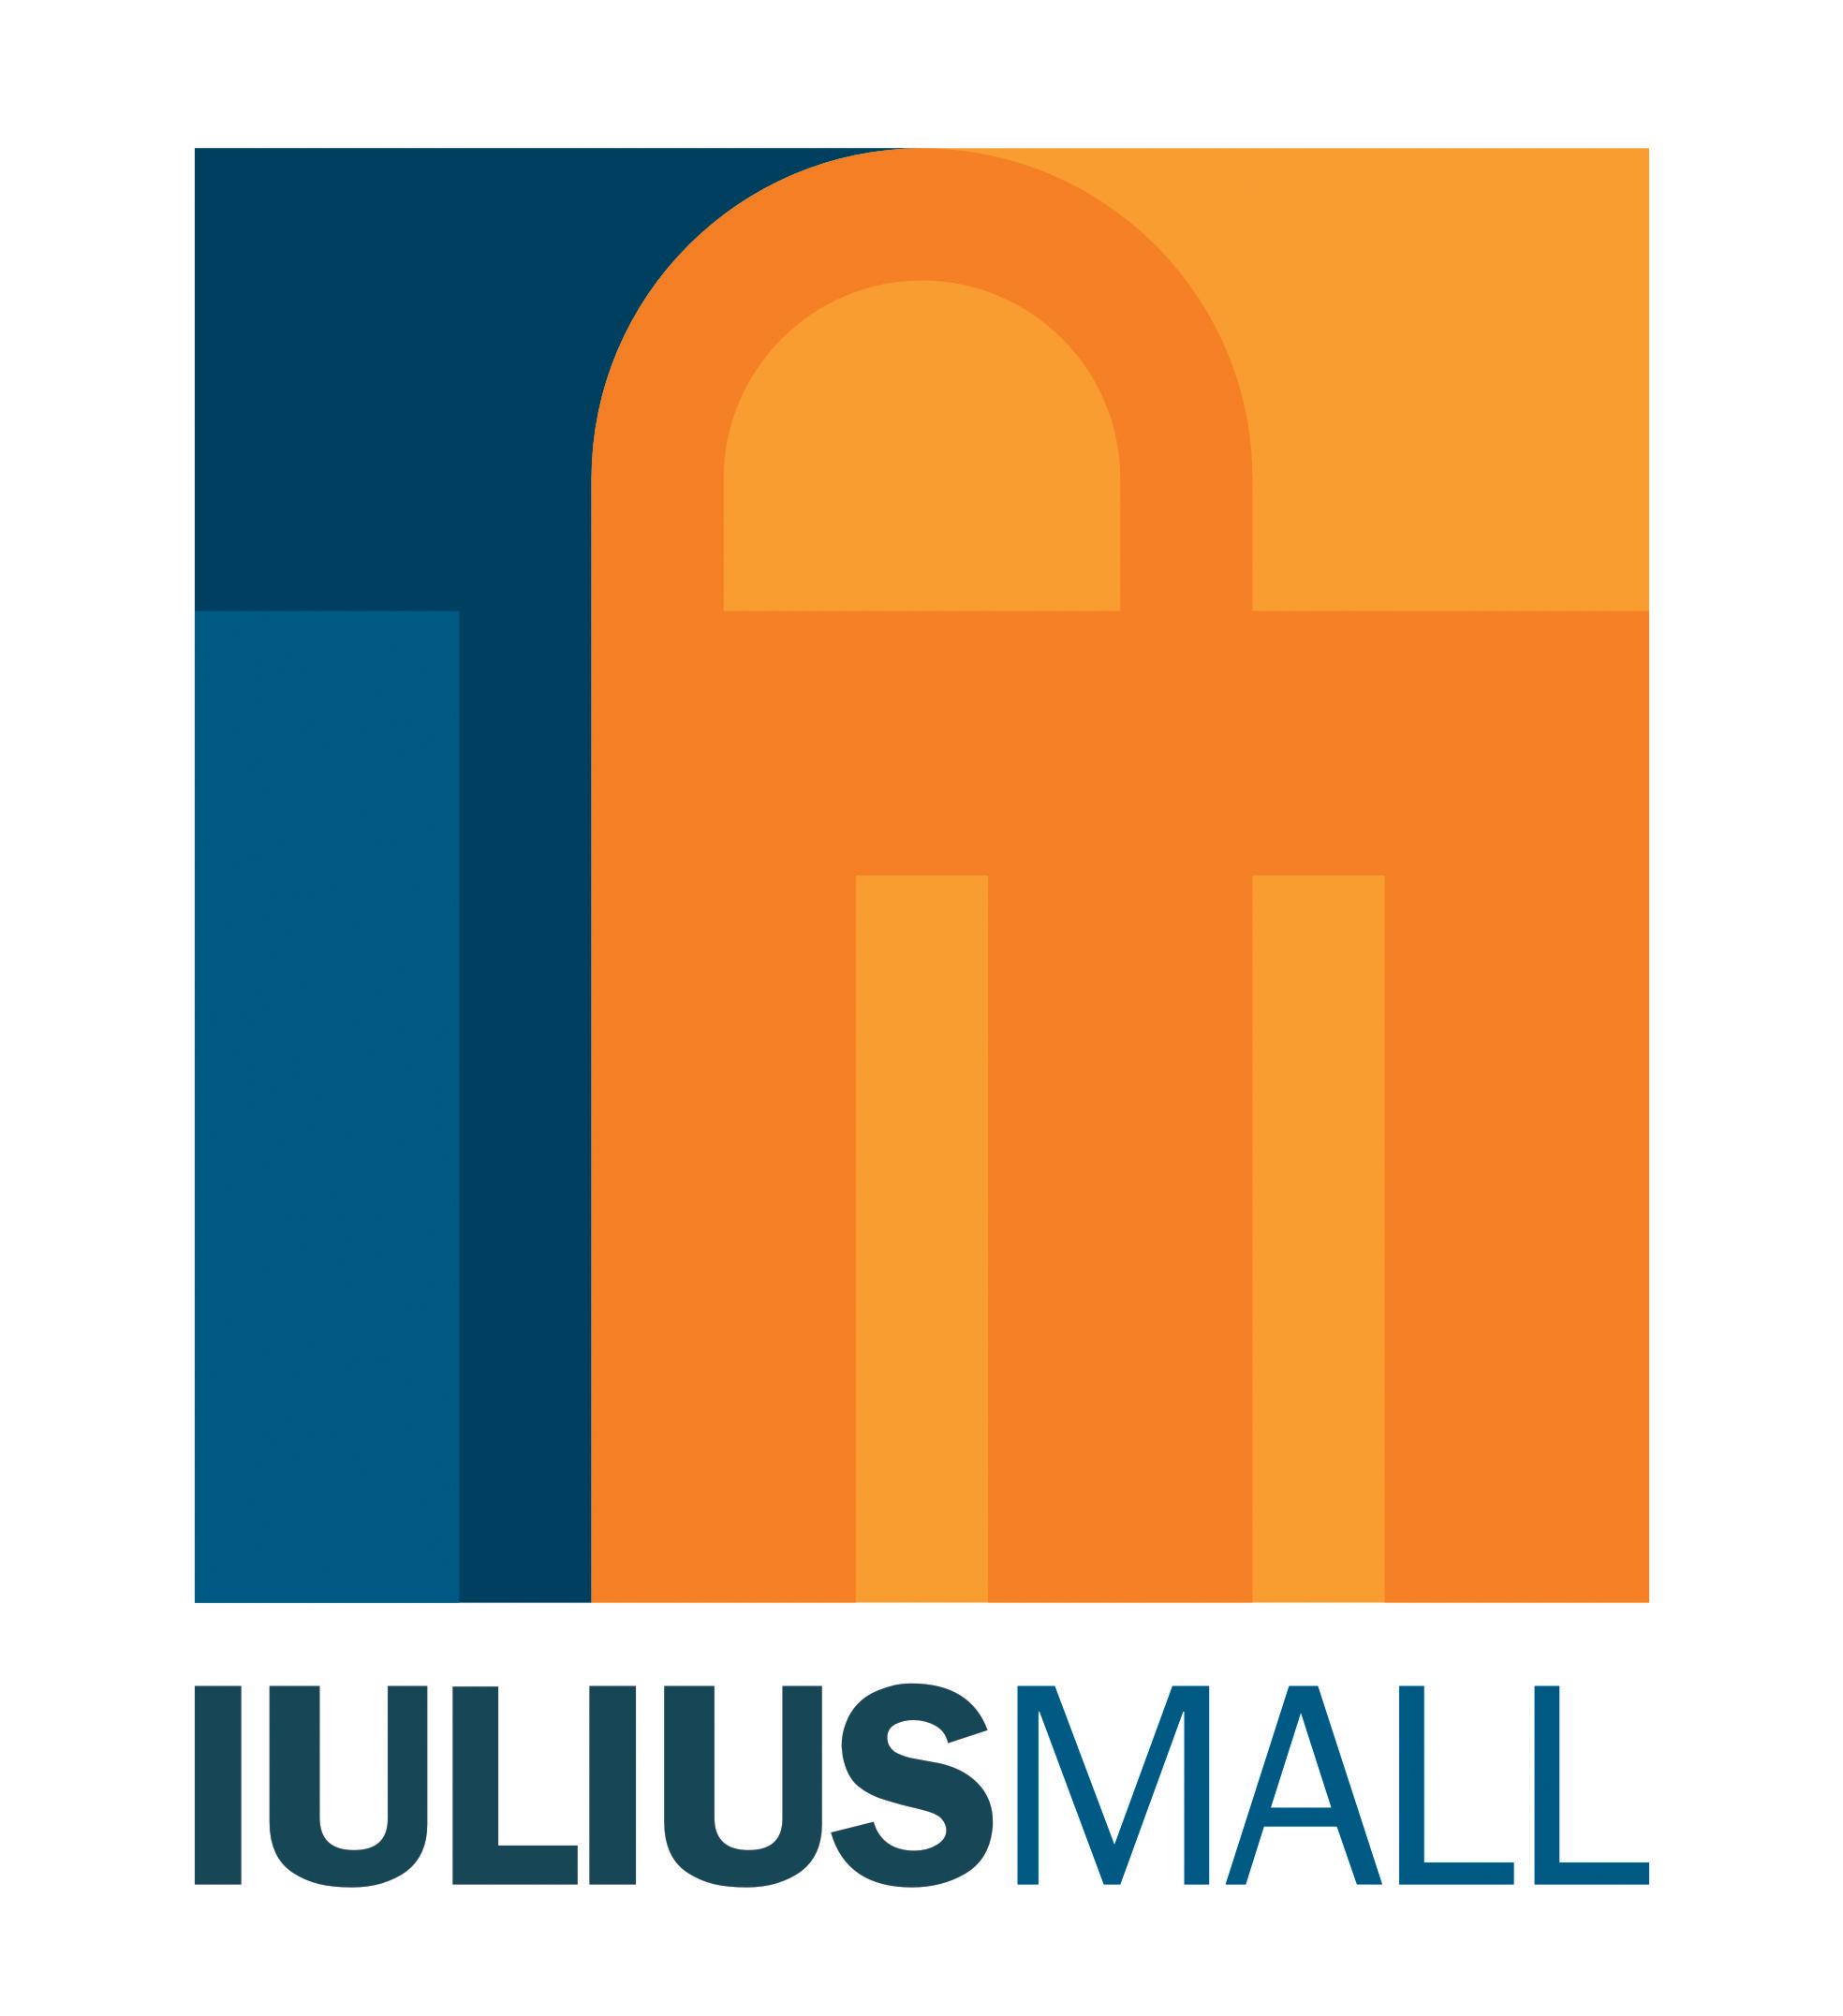 http://www.iuliusmall.com/